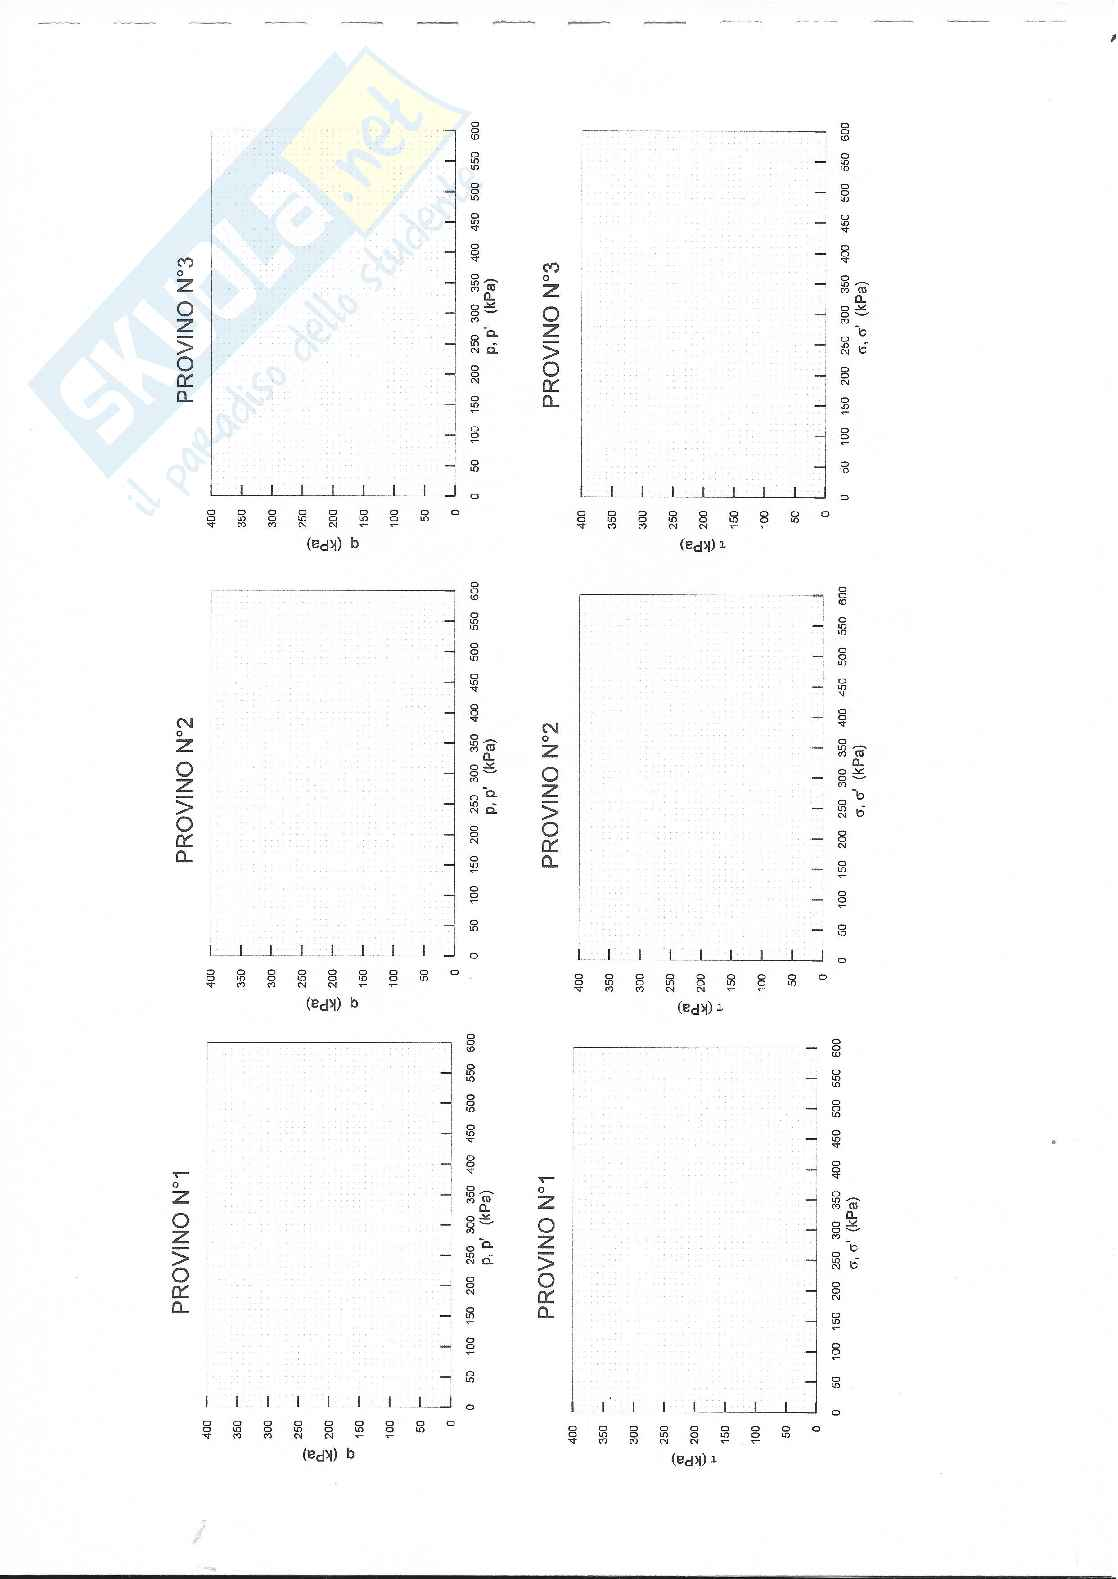 Fondamenti di geotecnica: 28 Esercitazioni svolte Pag. 16